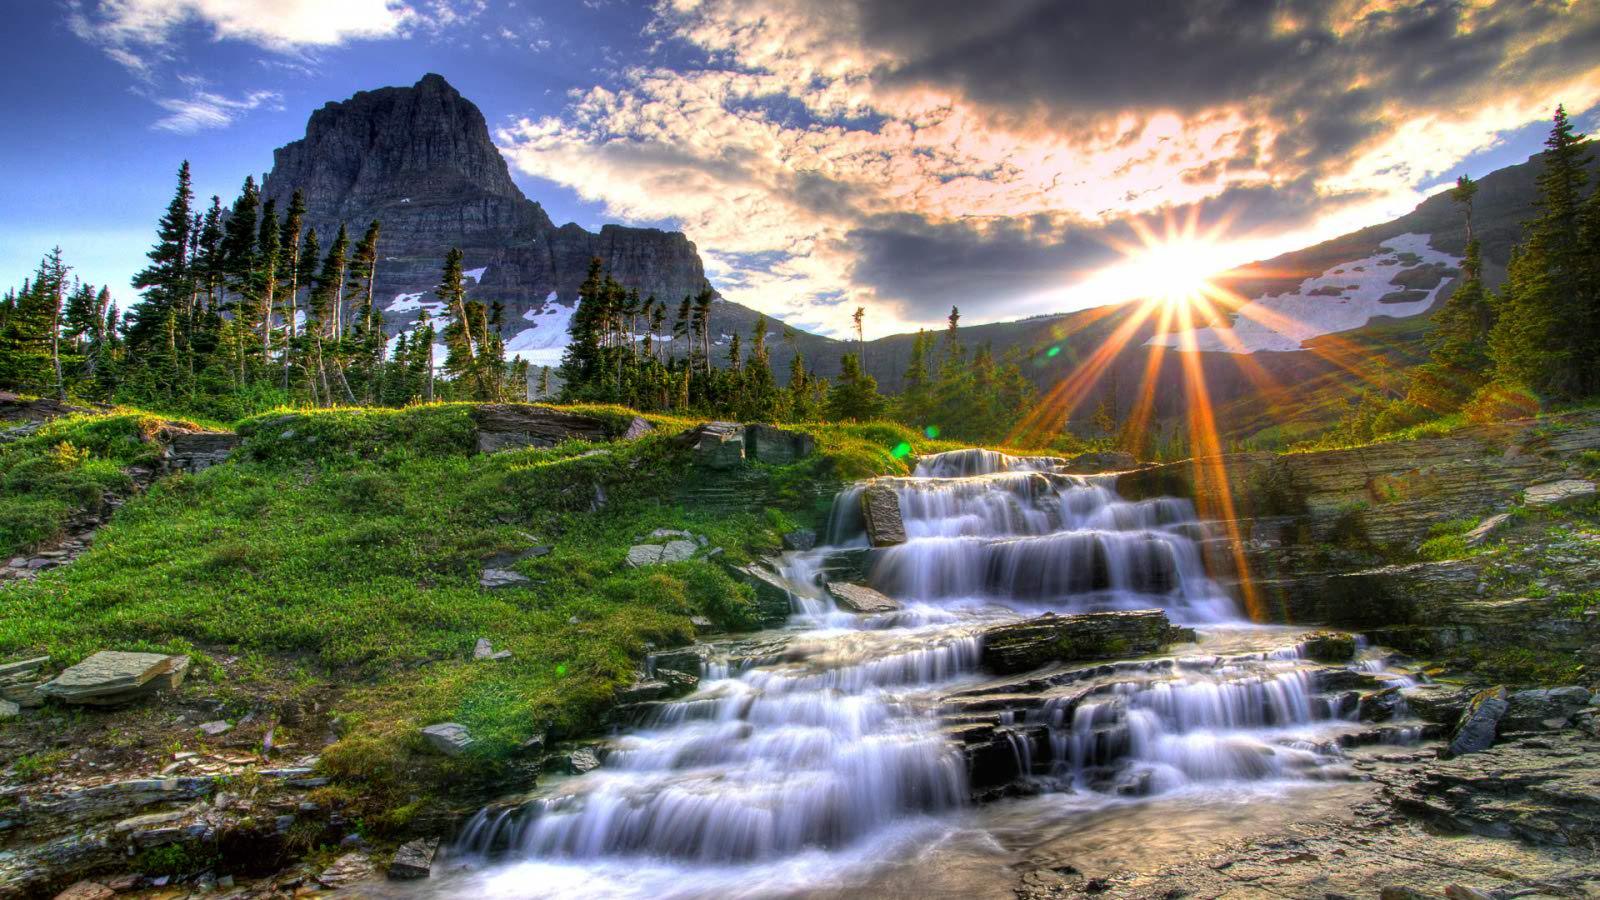 natural beautiful landscape image